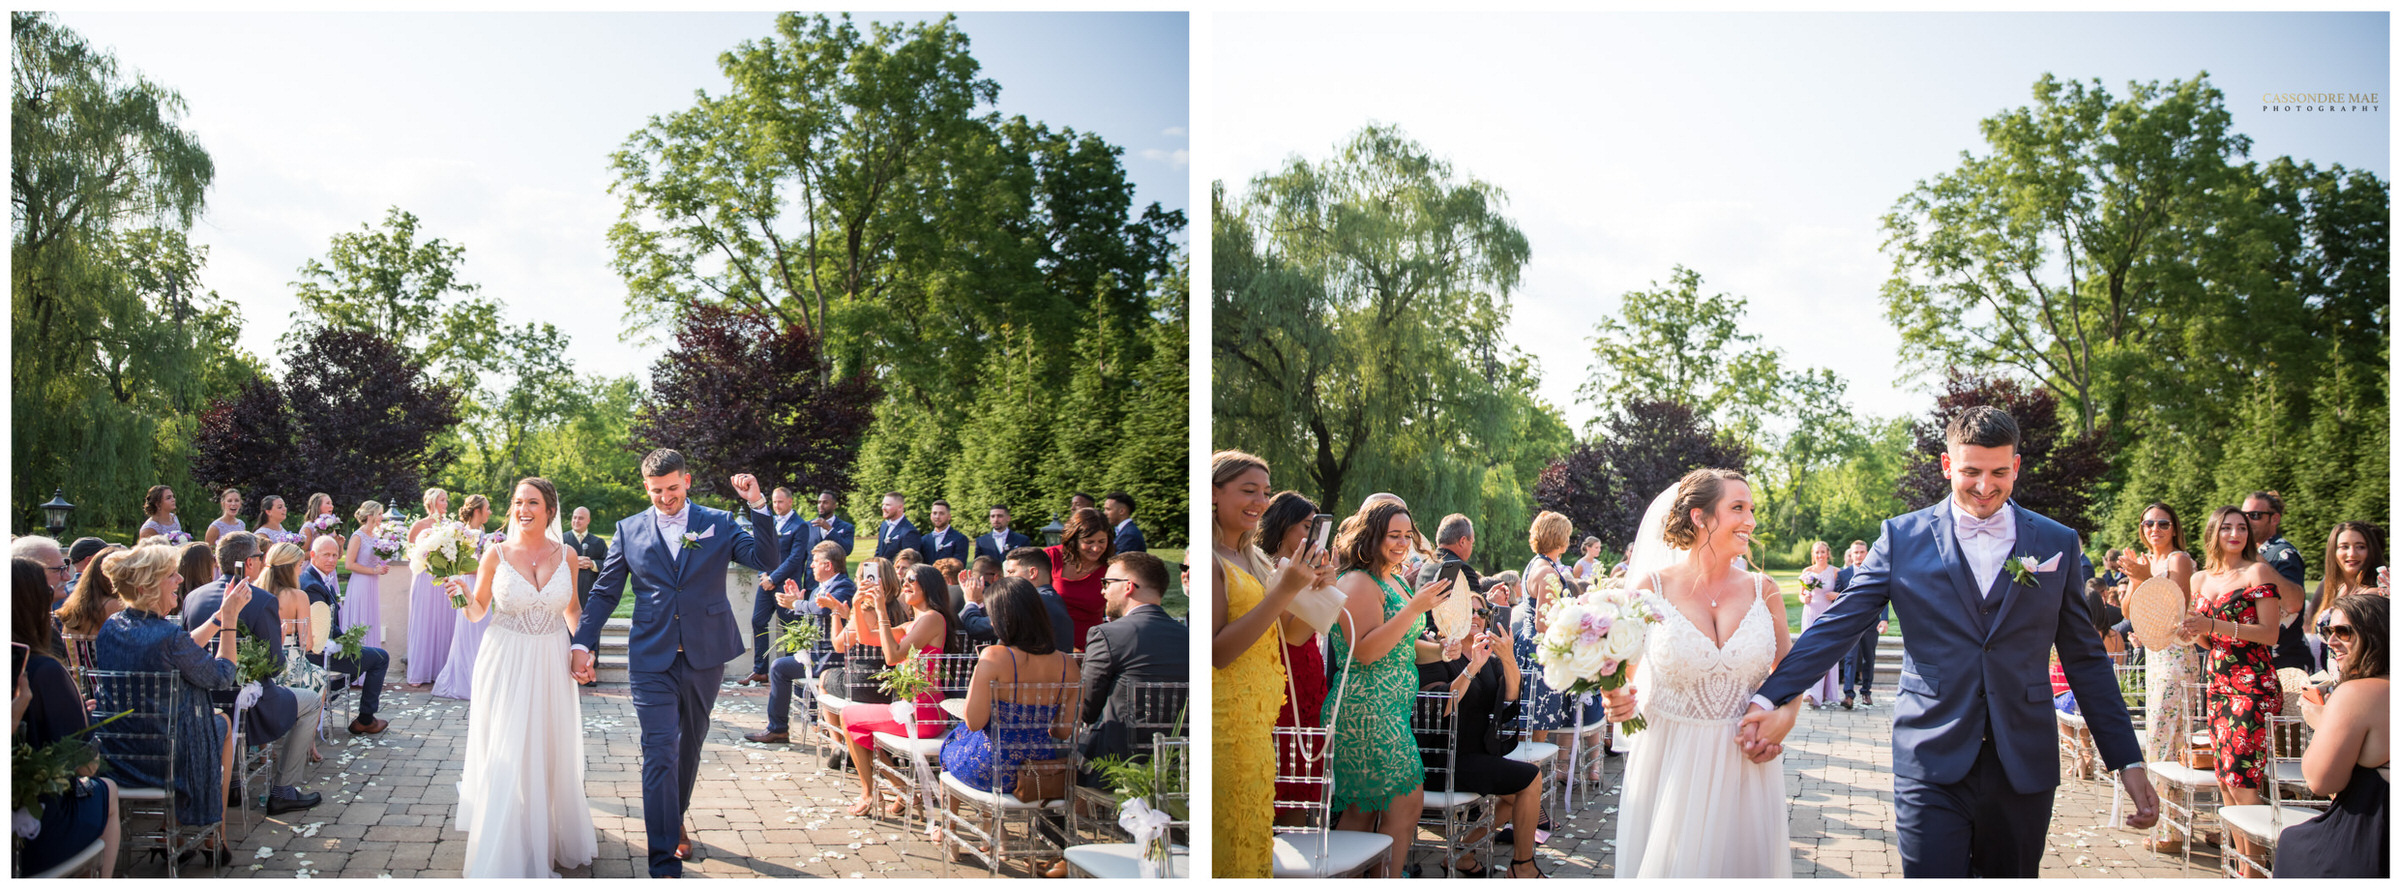 Cassondre Mae Photography Villa Venezia Wedding Photographer 15.jpg